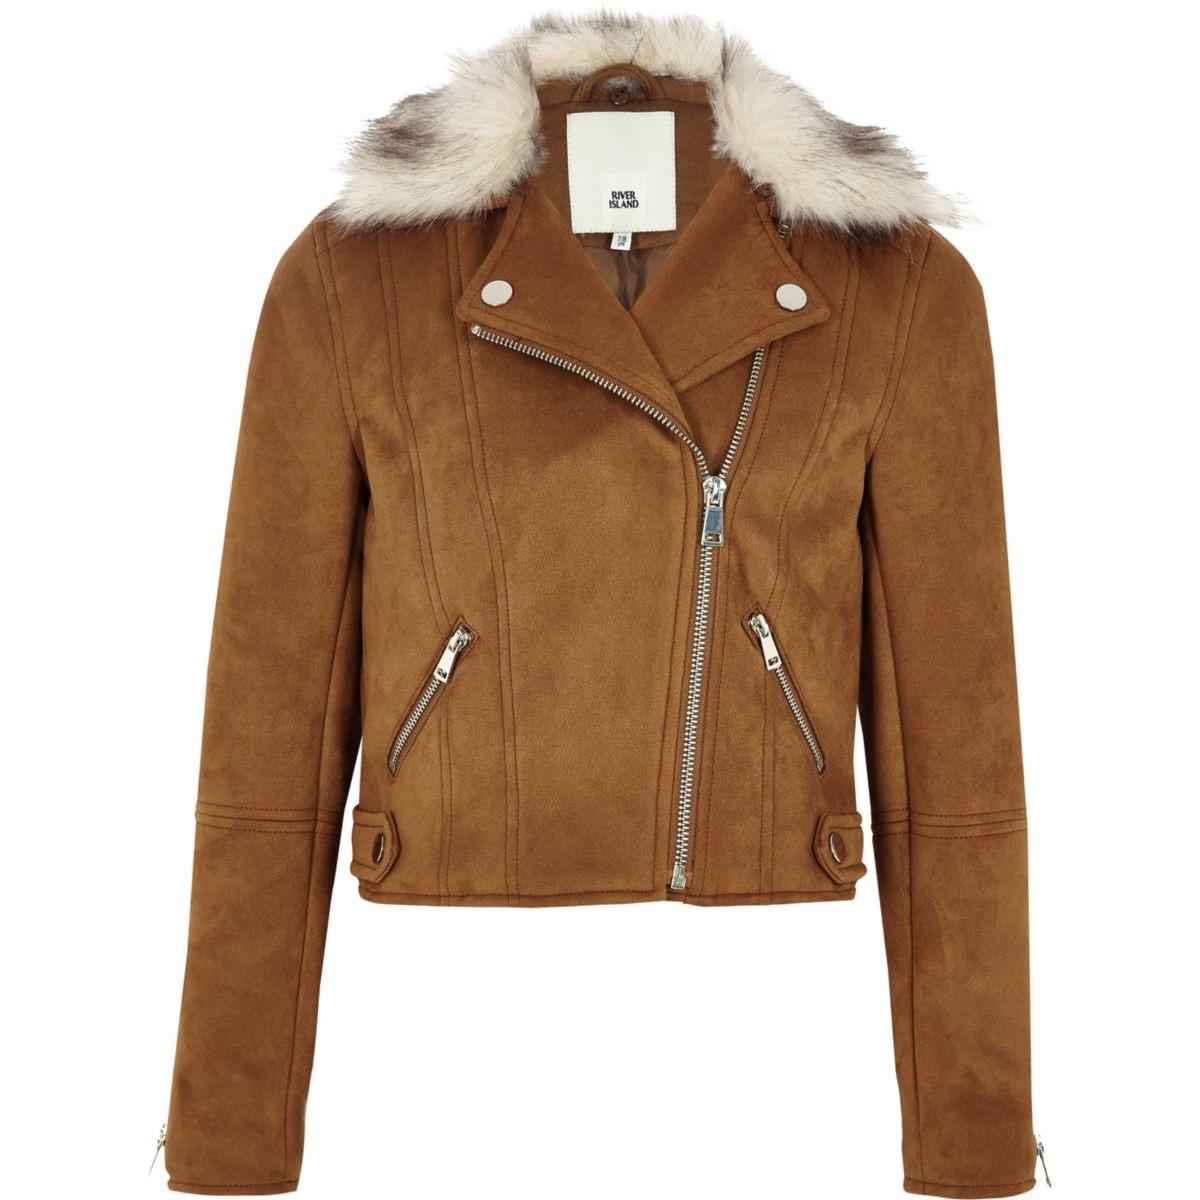 Girls brown faux suede fur biker jacket